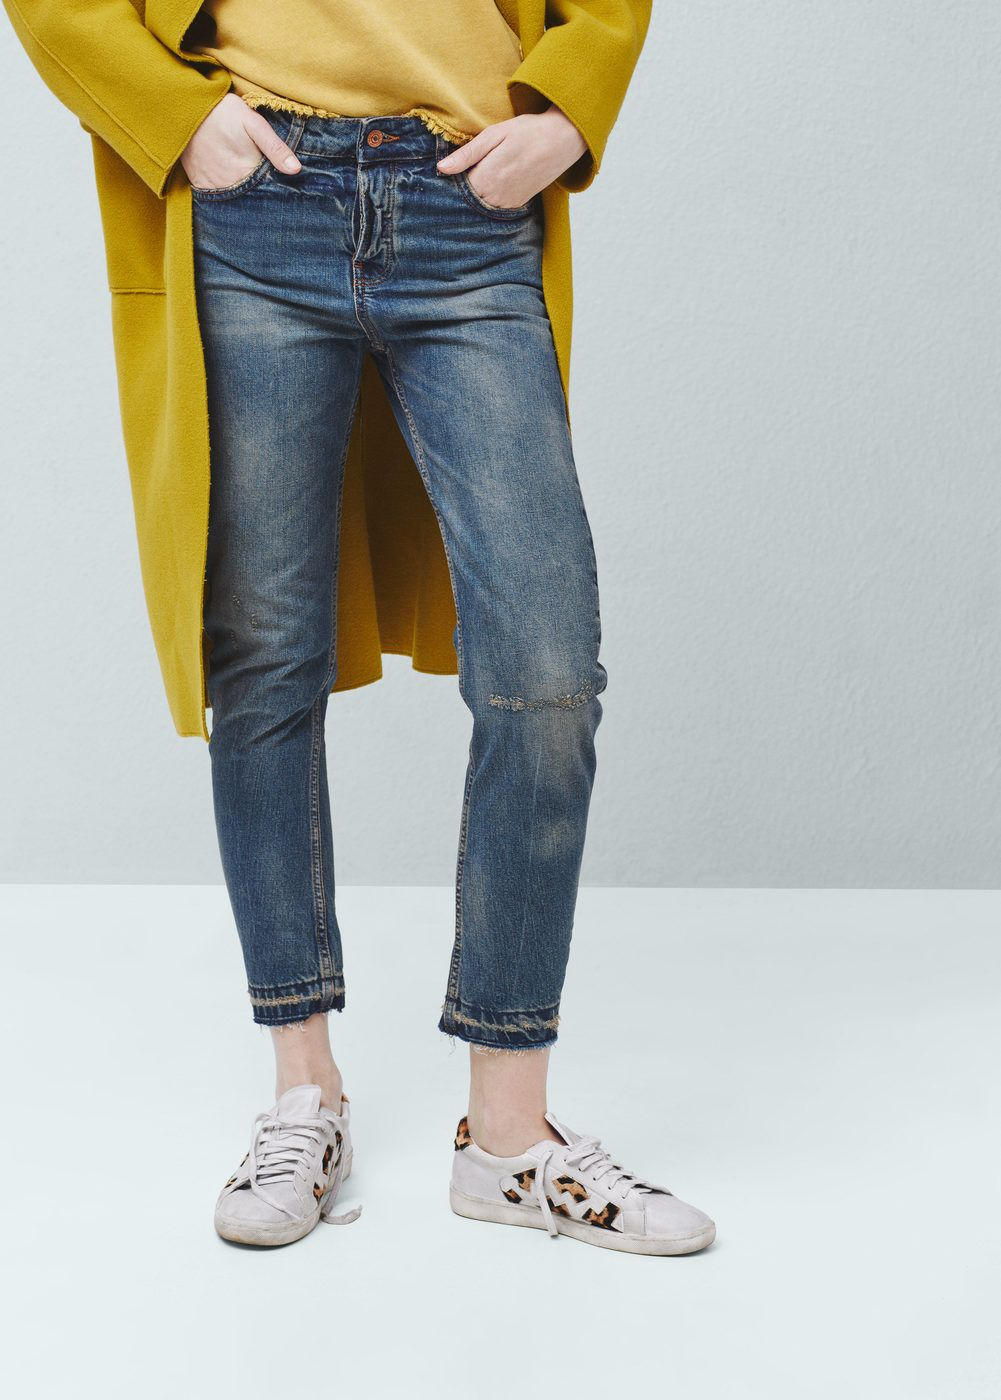 3ac0f6a6ffd14 Джинсы бойфренд angie - Женская   OUTFITS   Pinterest   Jeans, Jeans ...